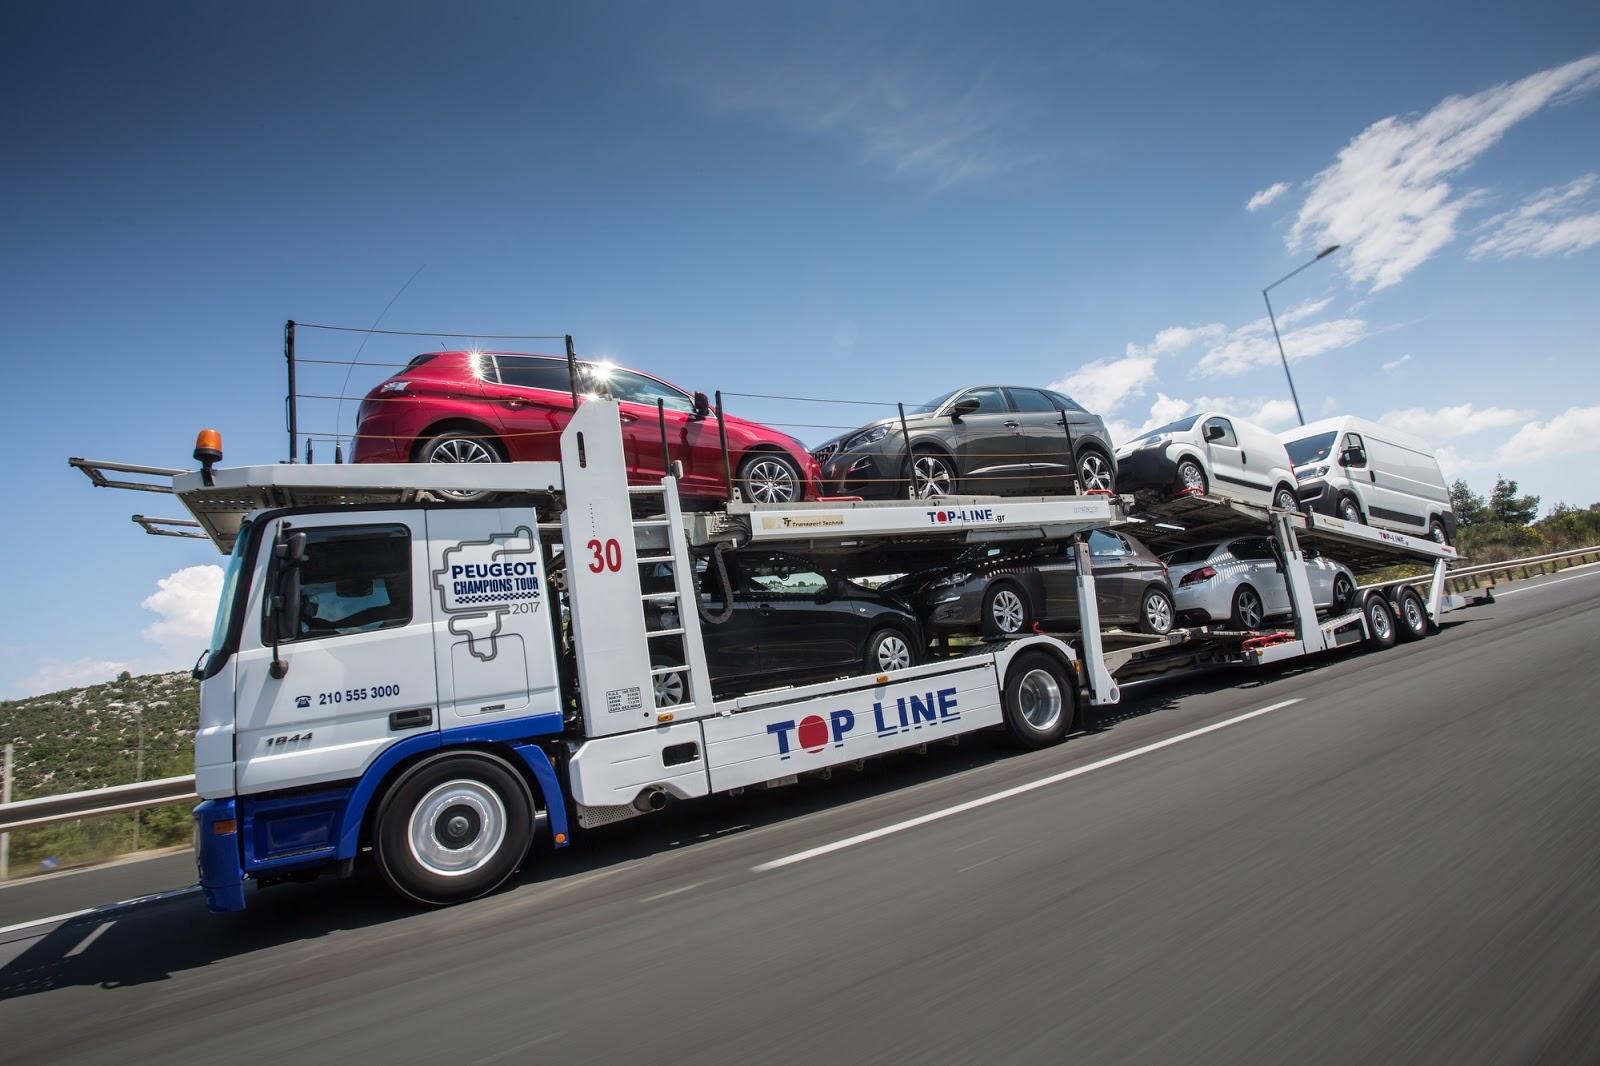 PHOTO2B3 Τα Peugeot έρχονται στην πόρτα σου για να τα οδηγήσεις! Peugeot, αυτοκίνητα, καινούργιο, καινούρια, καινούριο, μεταχειρισμένα, μεταχειρισμένο